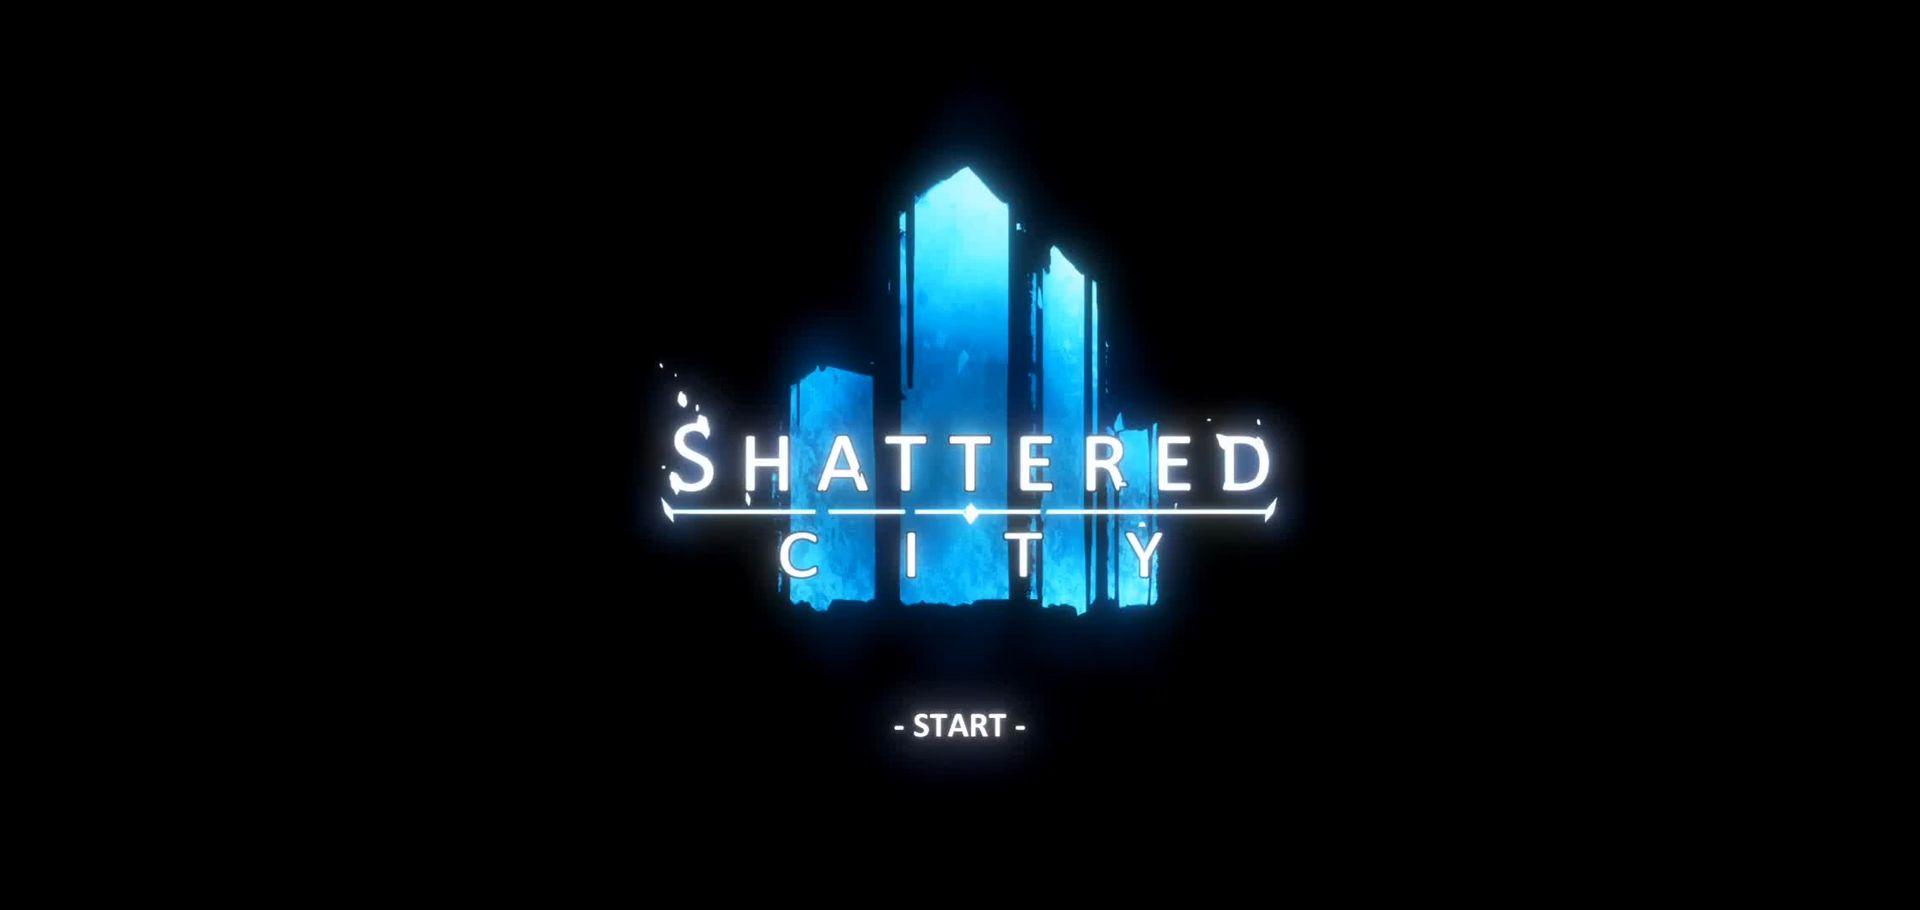 Shattered City screenshot 1